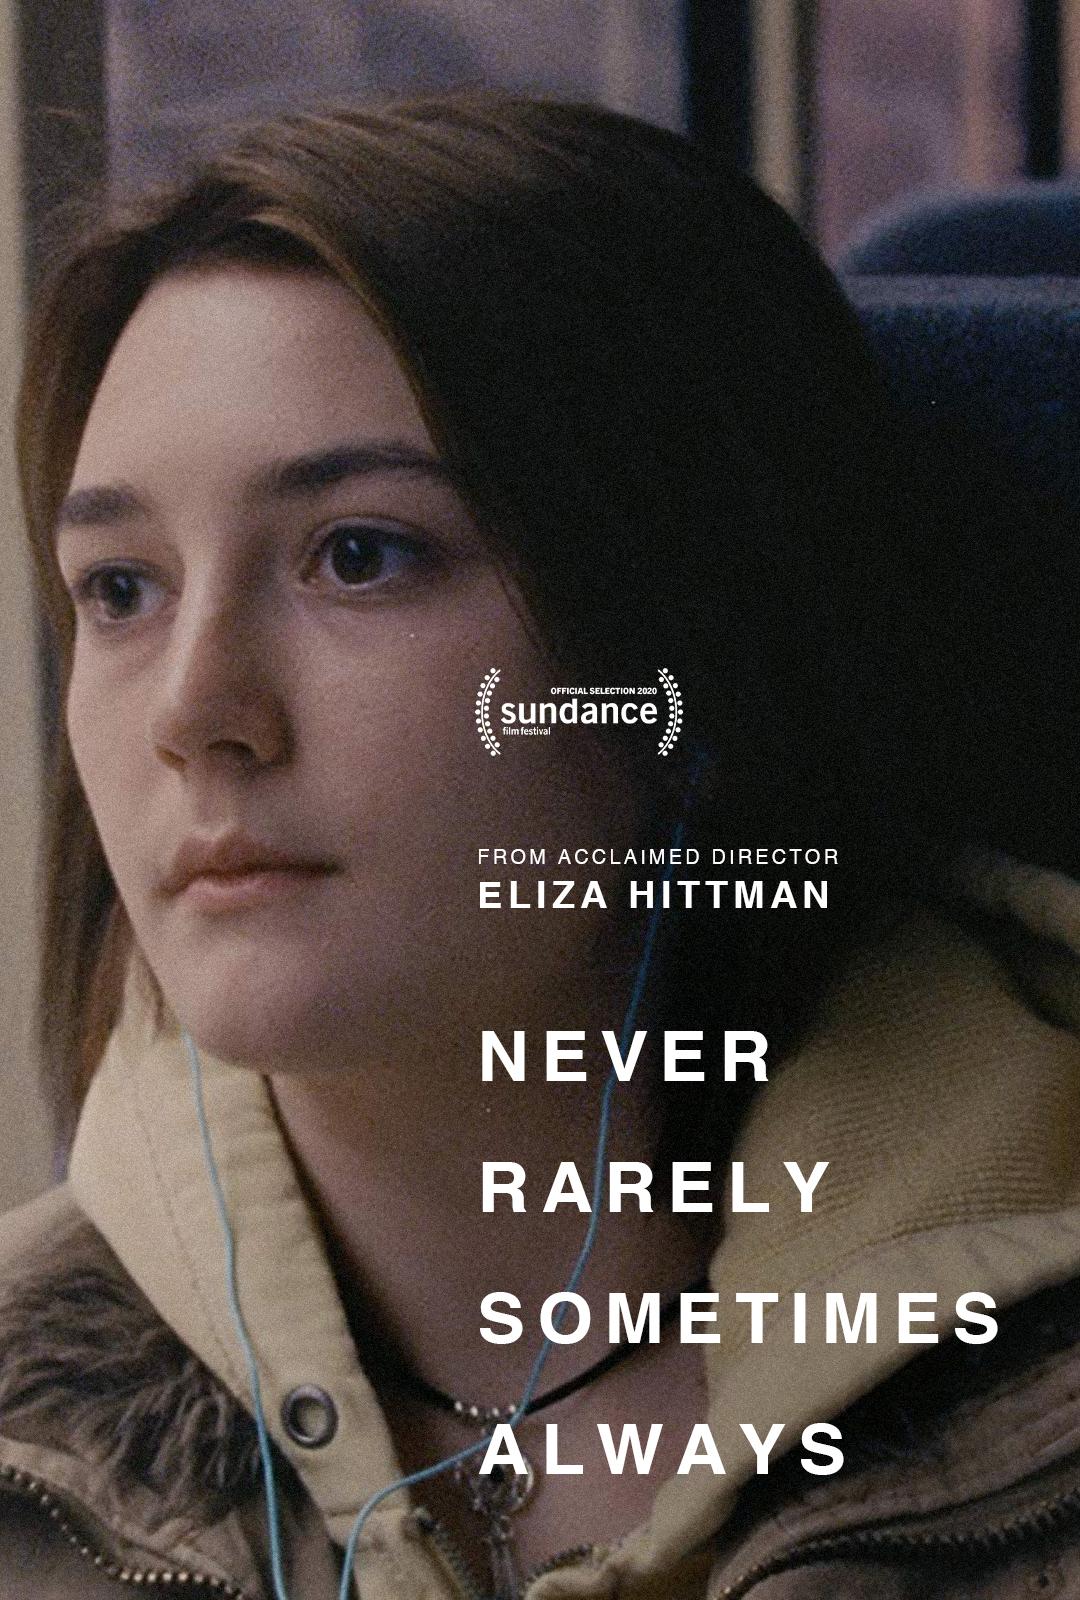 EVERY FILM